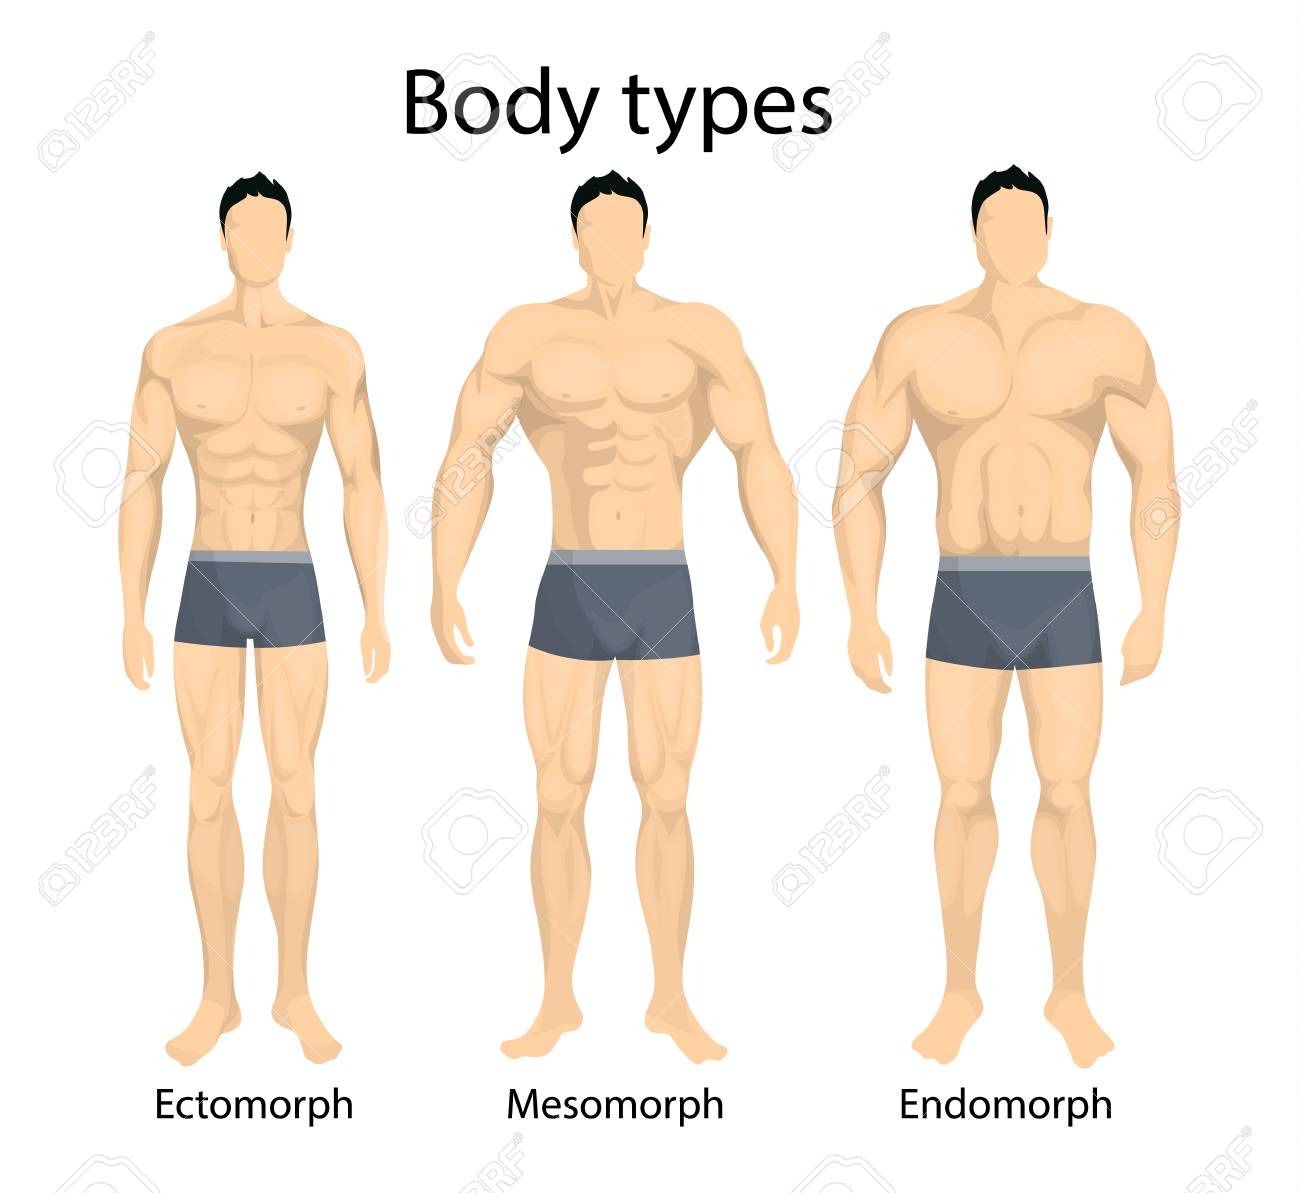 Male body types. - 88525749